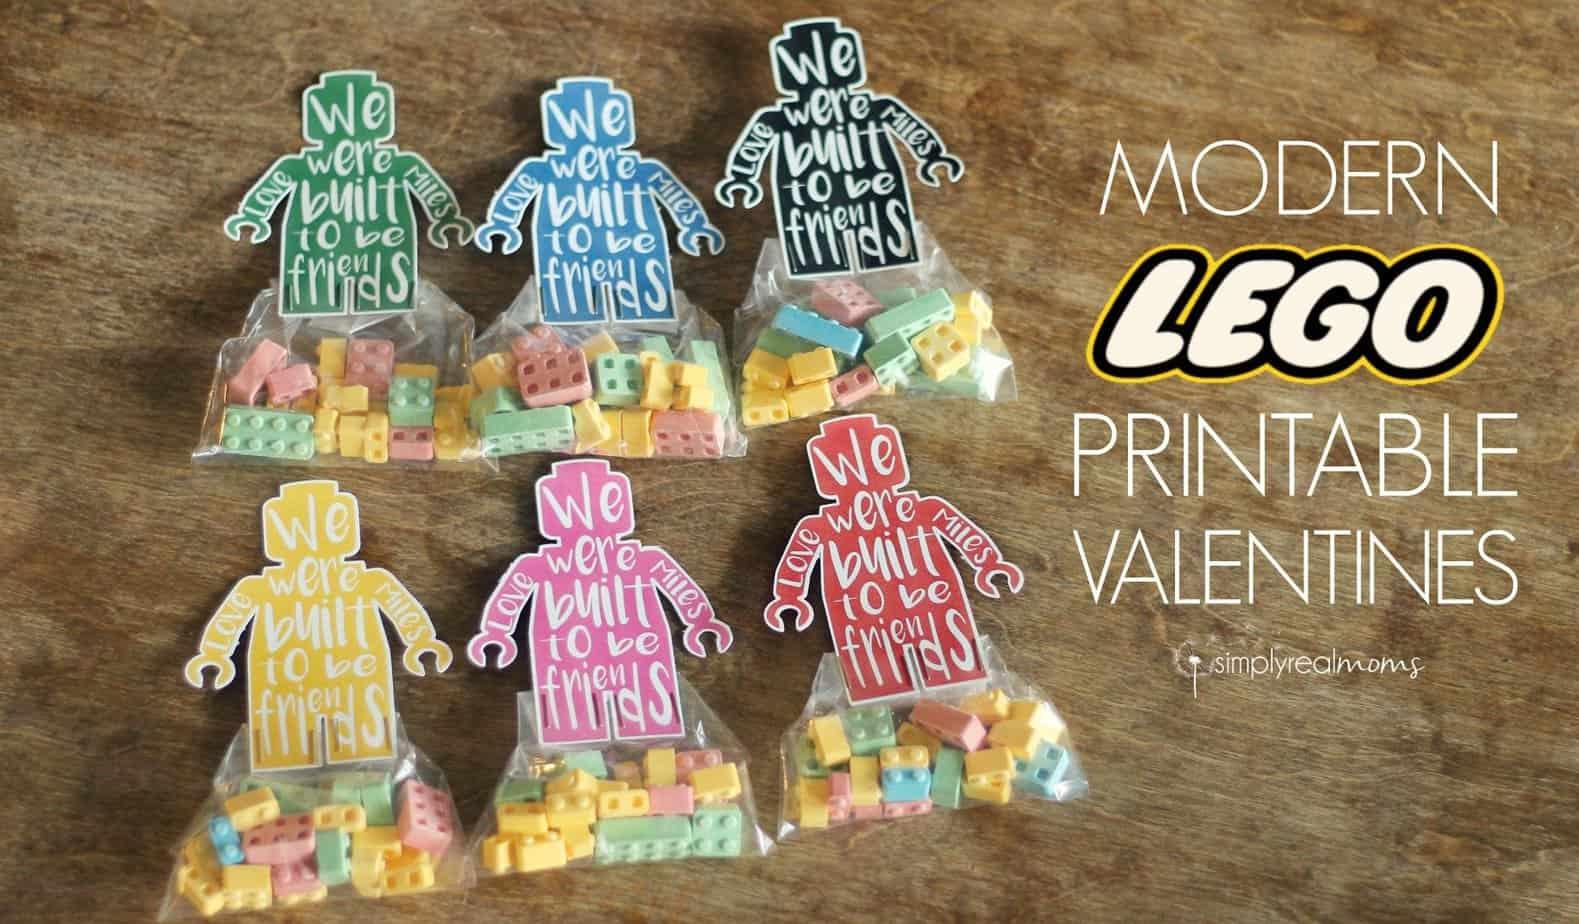 Modern Lego Printable Valentines